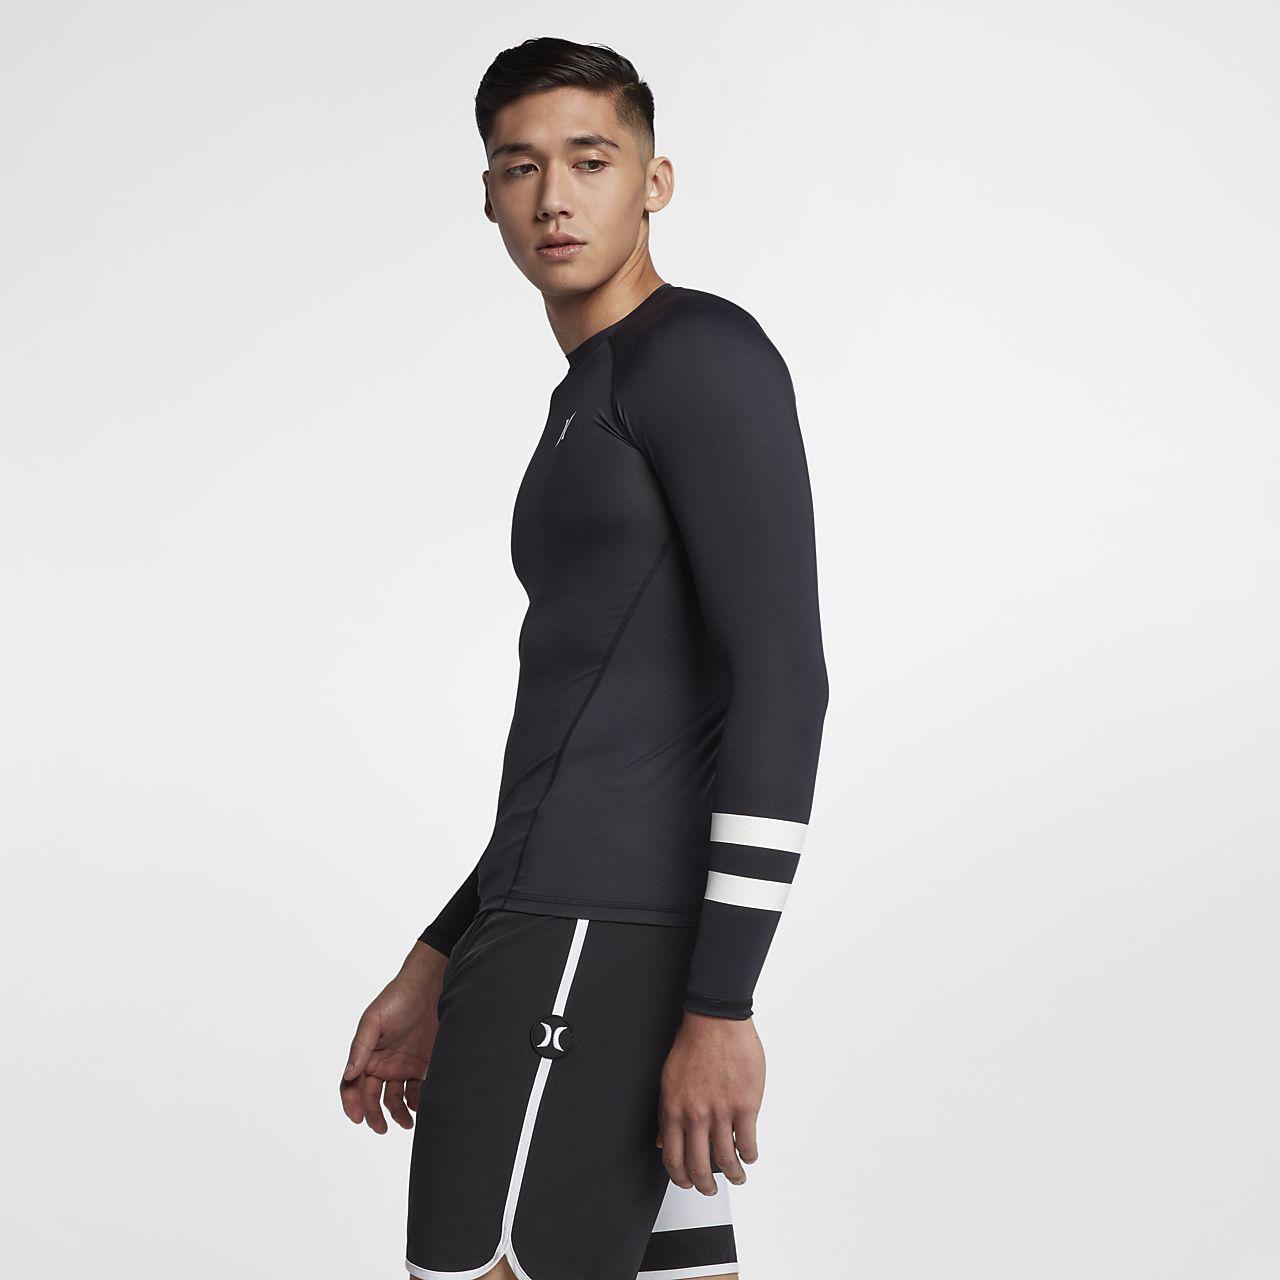 eafa5b2320b4 Ανδρική μακρυμάνικη μπλούζα σέρφινγκ Hurley Pro Light. Nike.com GR